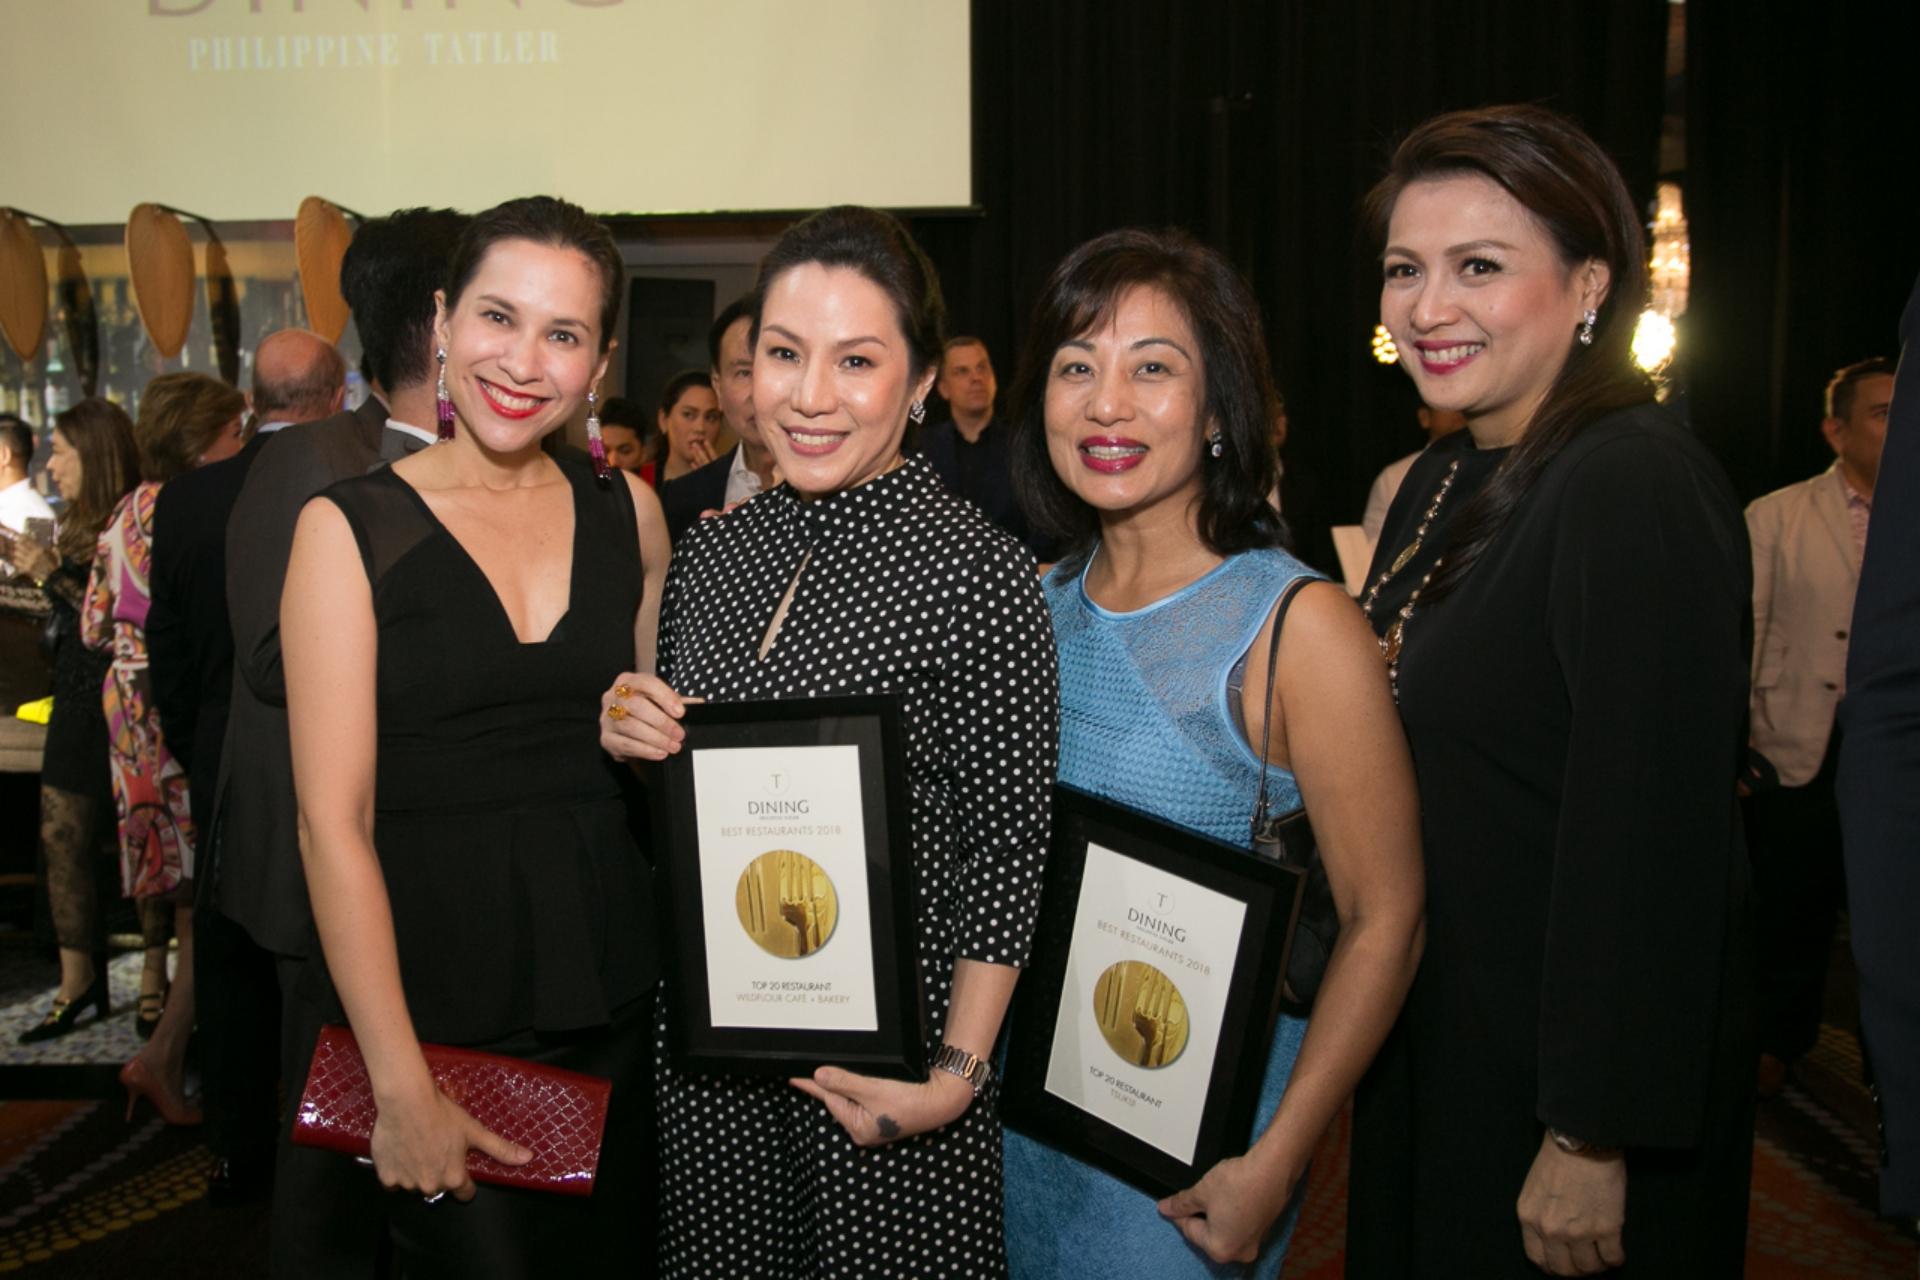 Audrey Tan Zubiri, Ana de Ocampo, Malu Gamboa, Michelle Tiangco